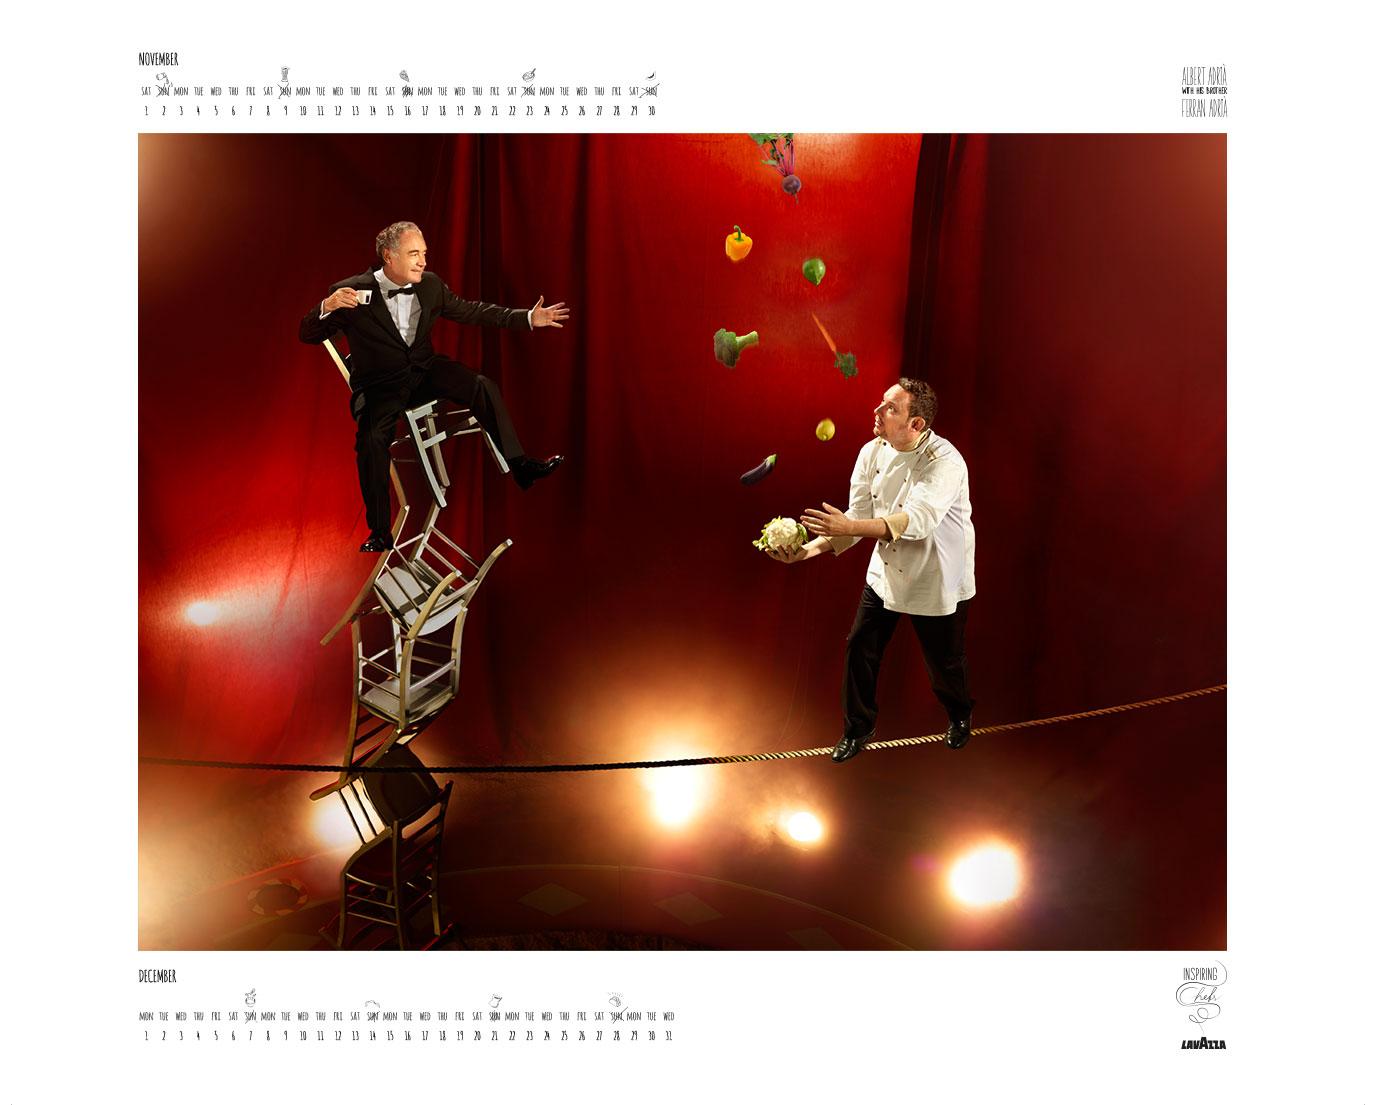 Lavazza_calendar_2014_November-December